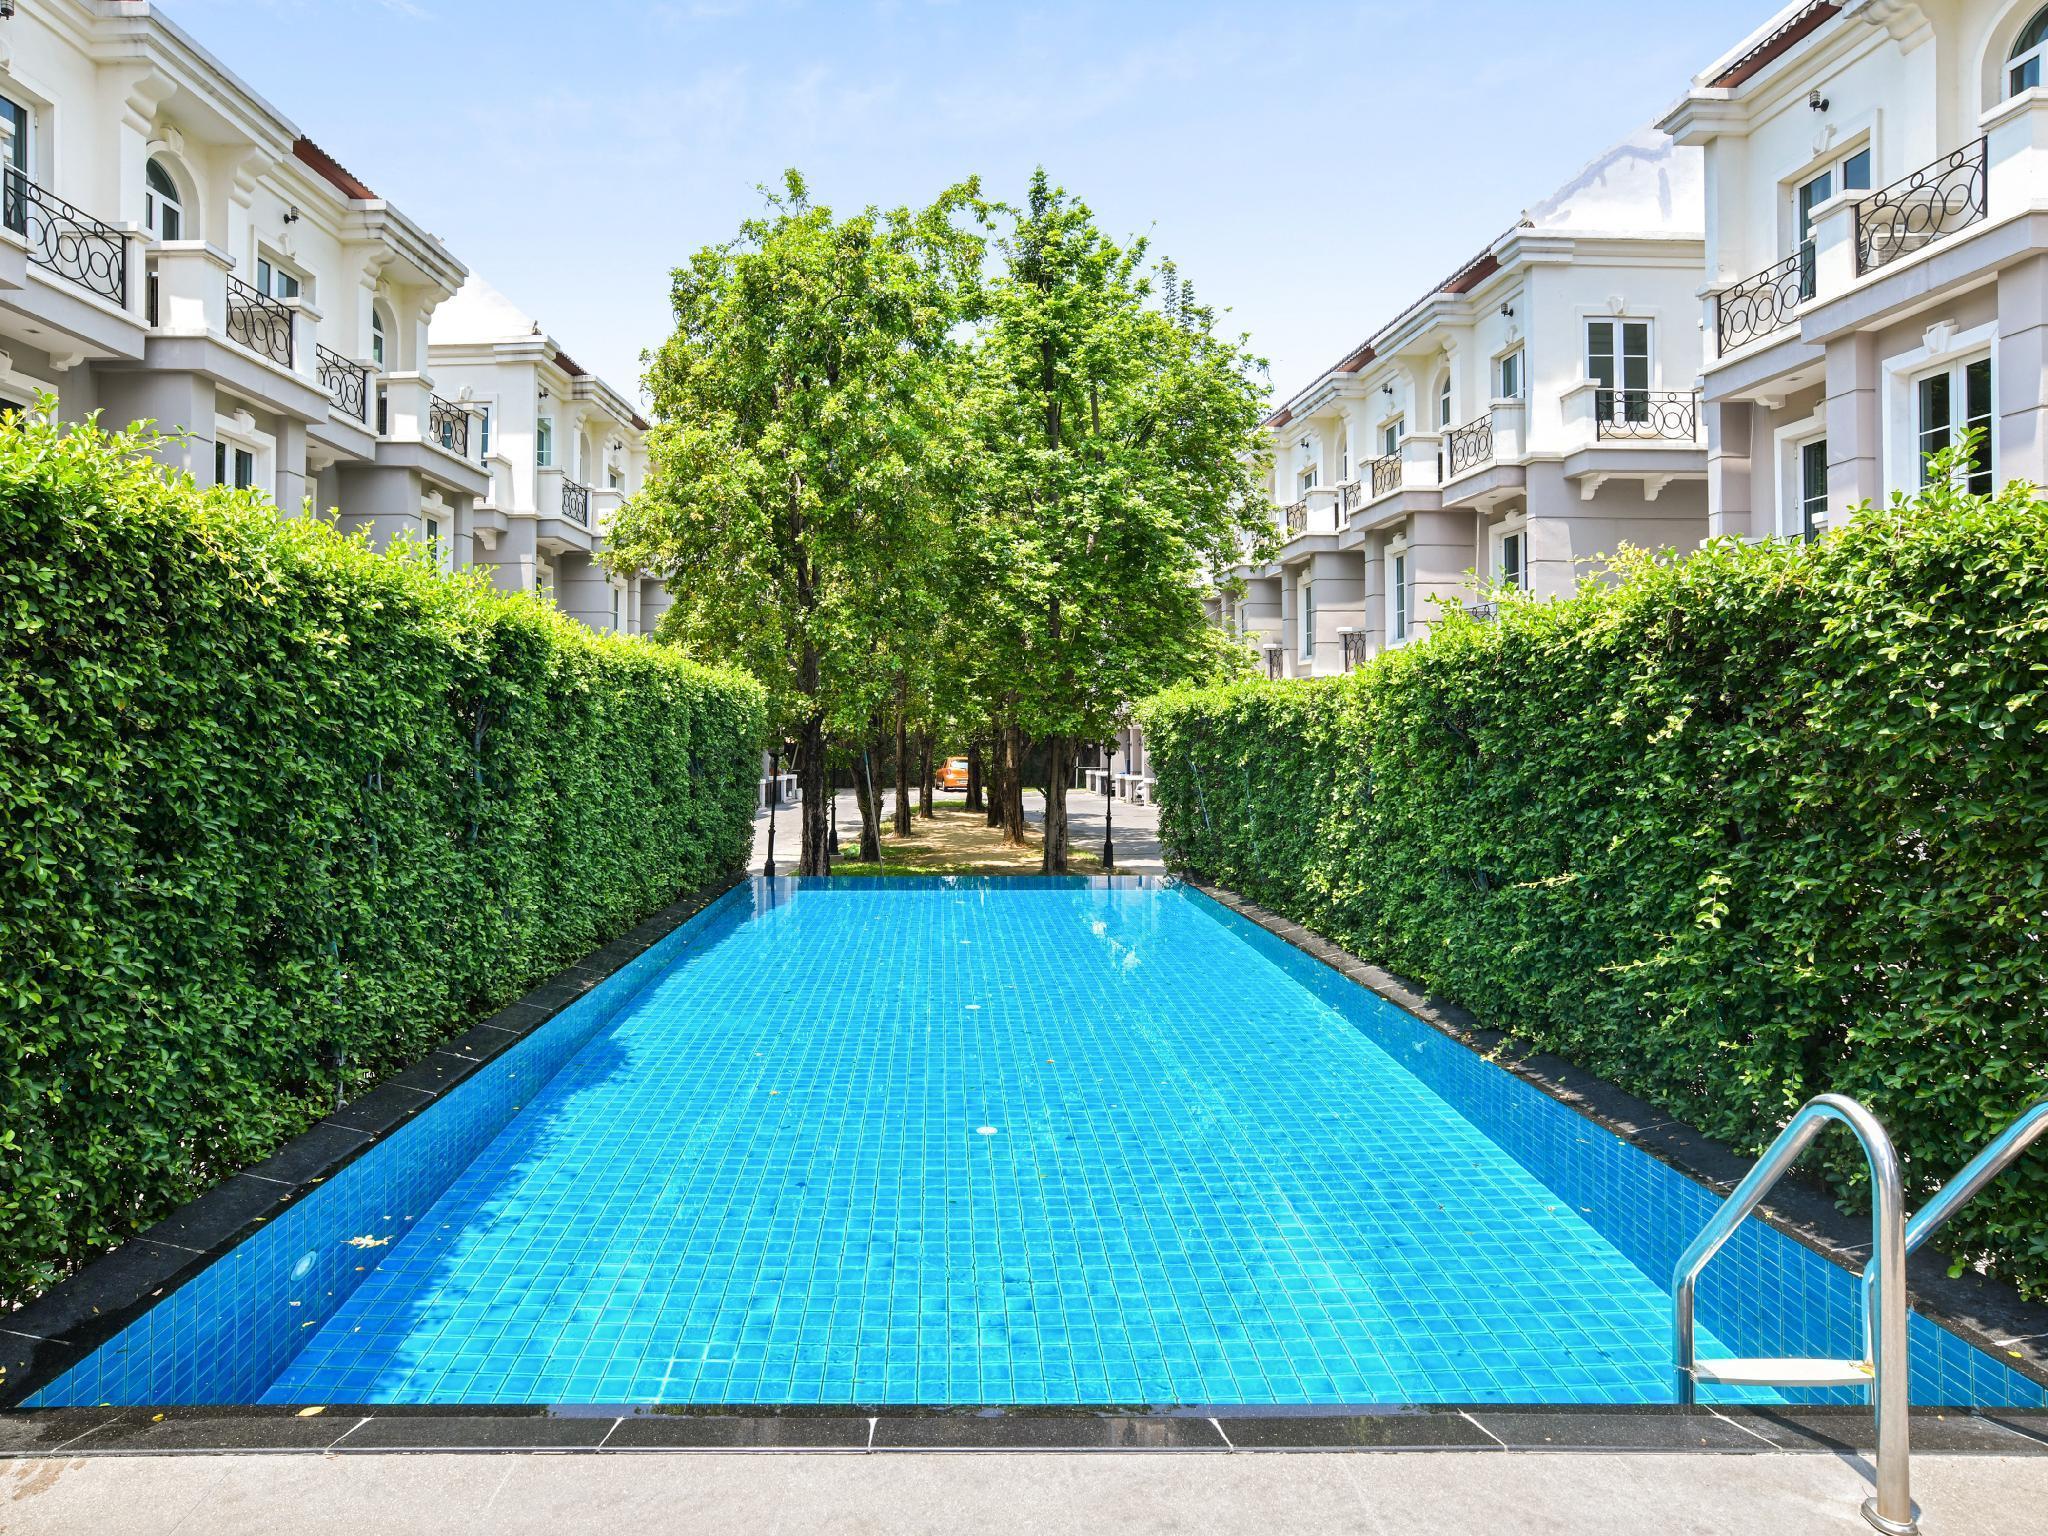 3 Bedrooms PerFect Home 106 at Sukhumvit 16 3 Bedrooms PerFect Home 106 at Sukhumvit 16